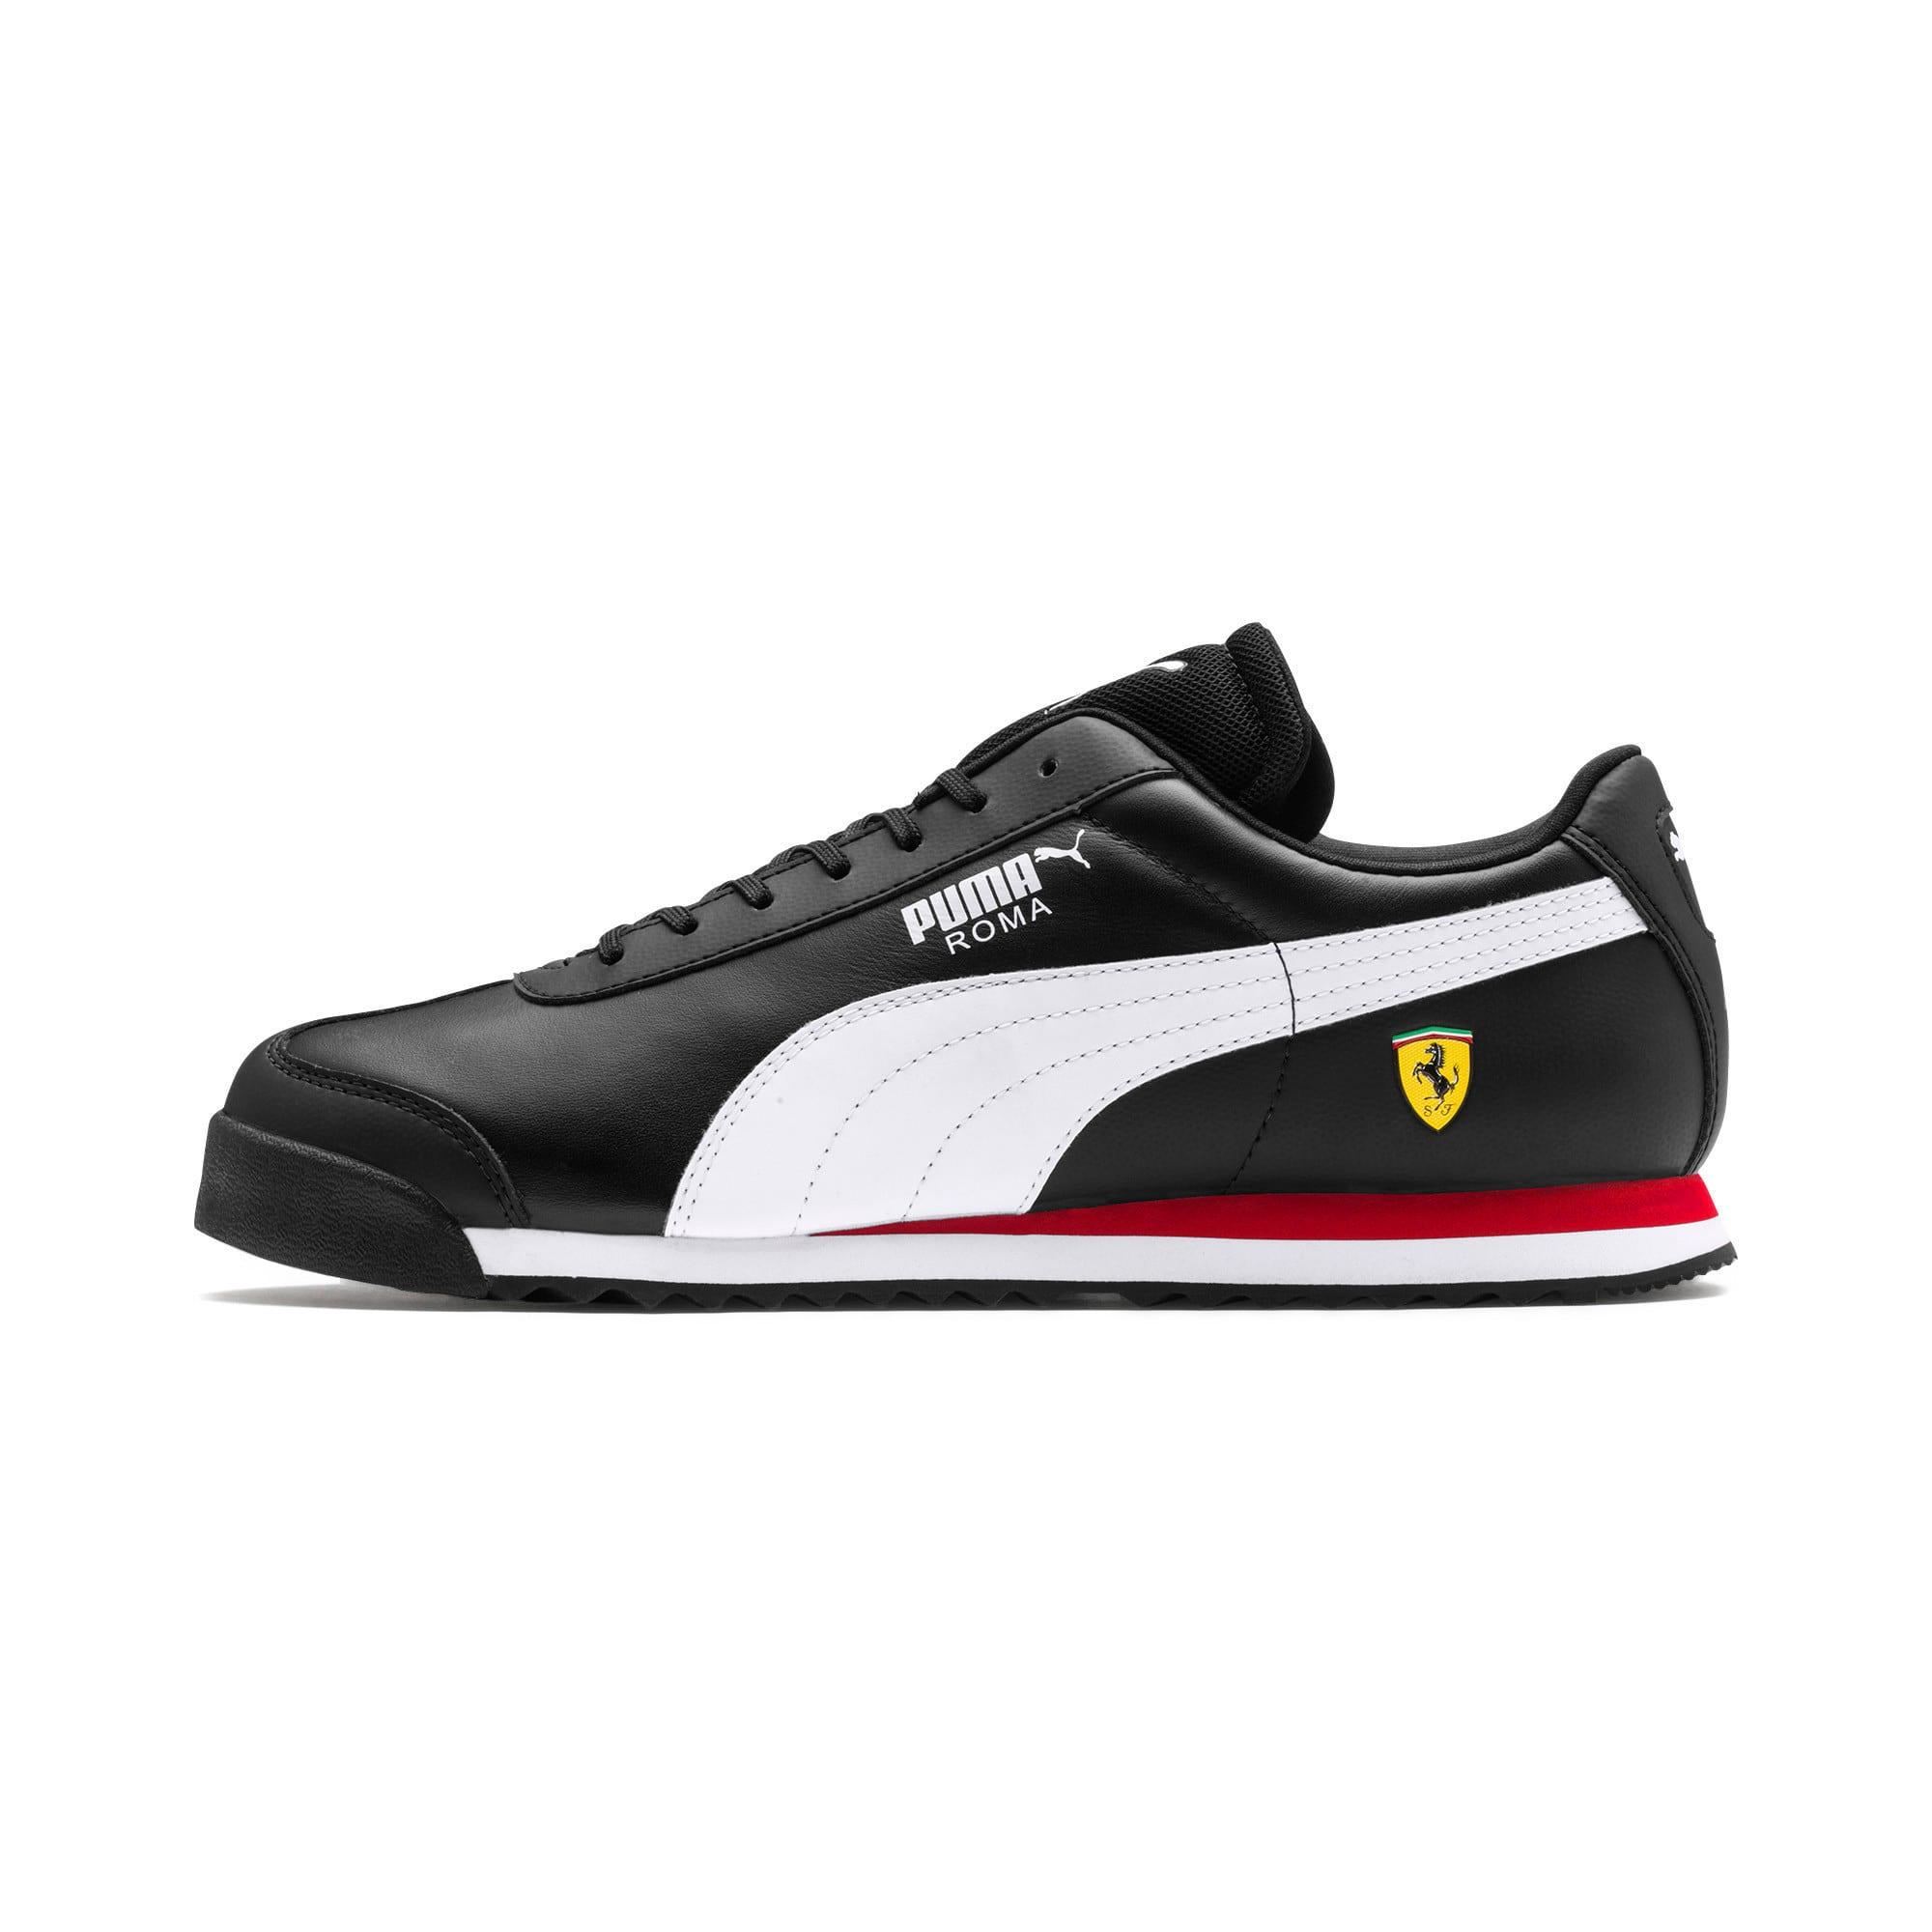 Thumbnail 1 of Ferrari Roma Men's Trainers, Black-White-Rosso Corsa, medium-IND